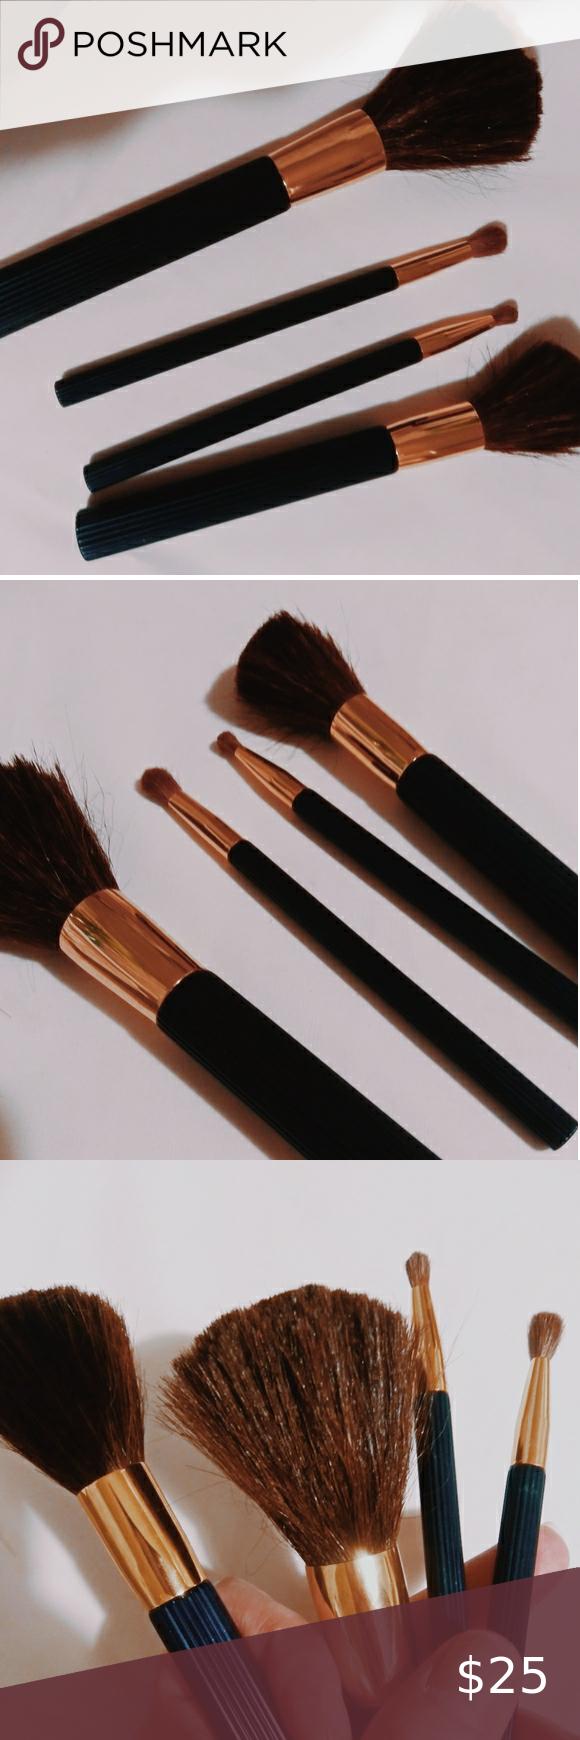 Estee Lauder Ribbed Makeup Brush Set Ribbed Navy Blue